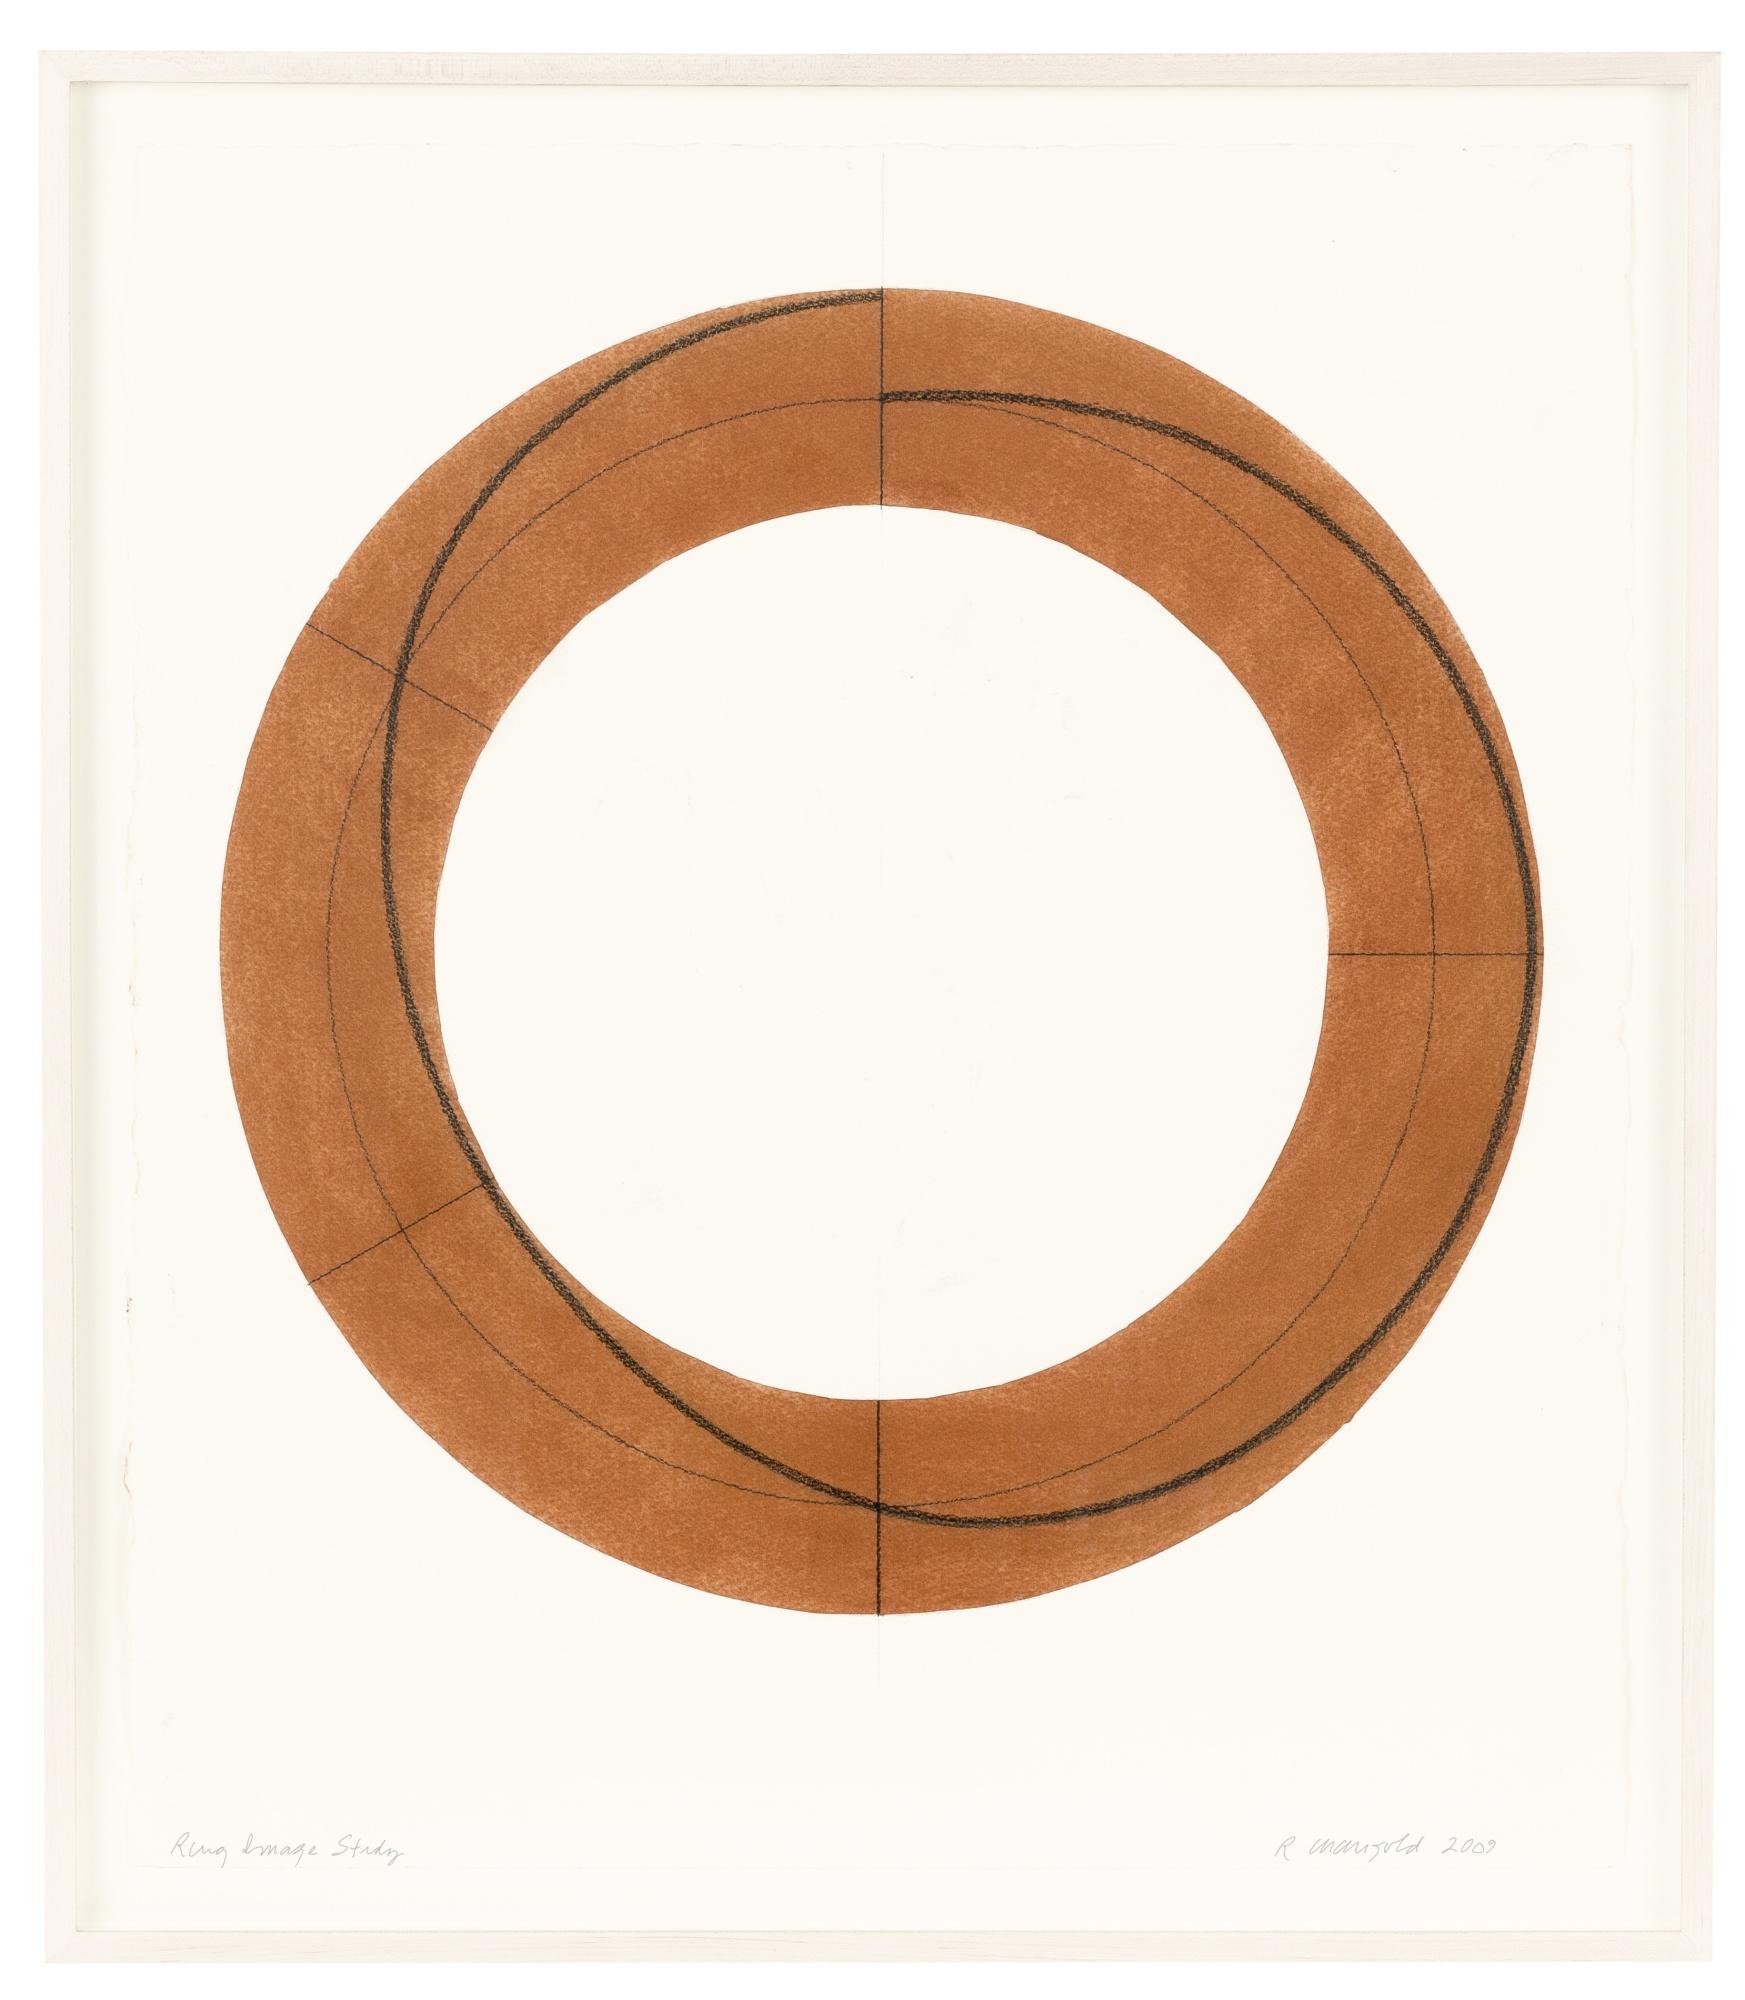 Robert Mangold-Ring Image Study-2009